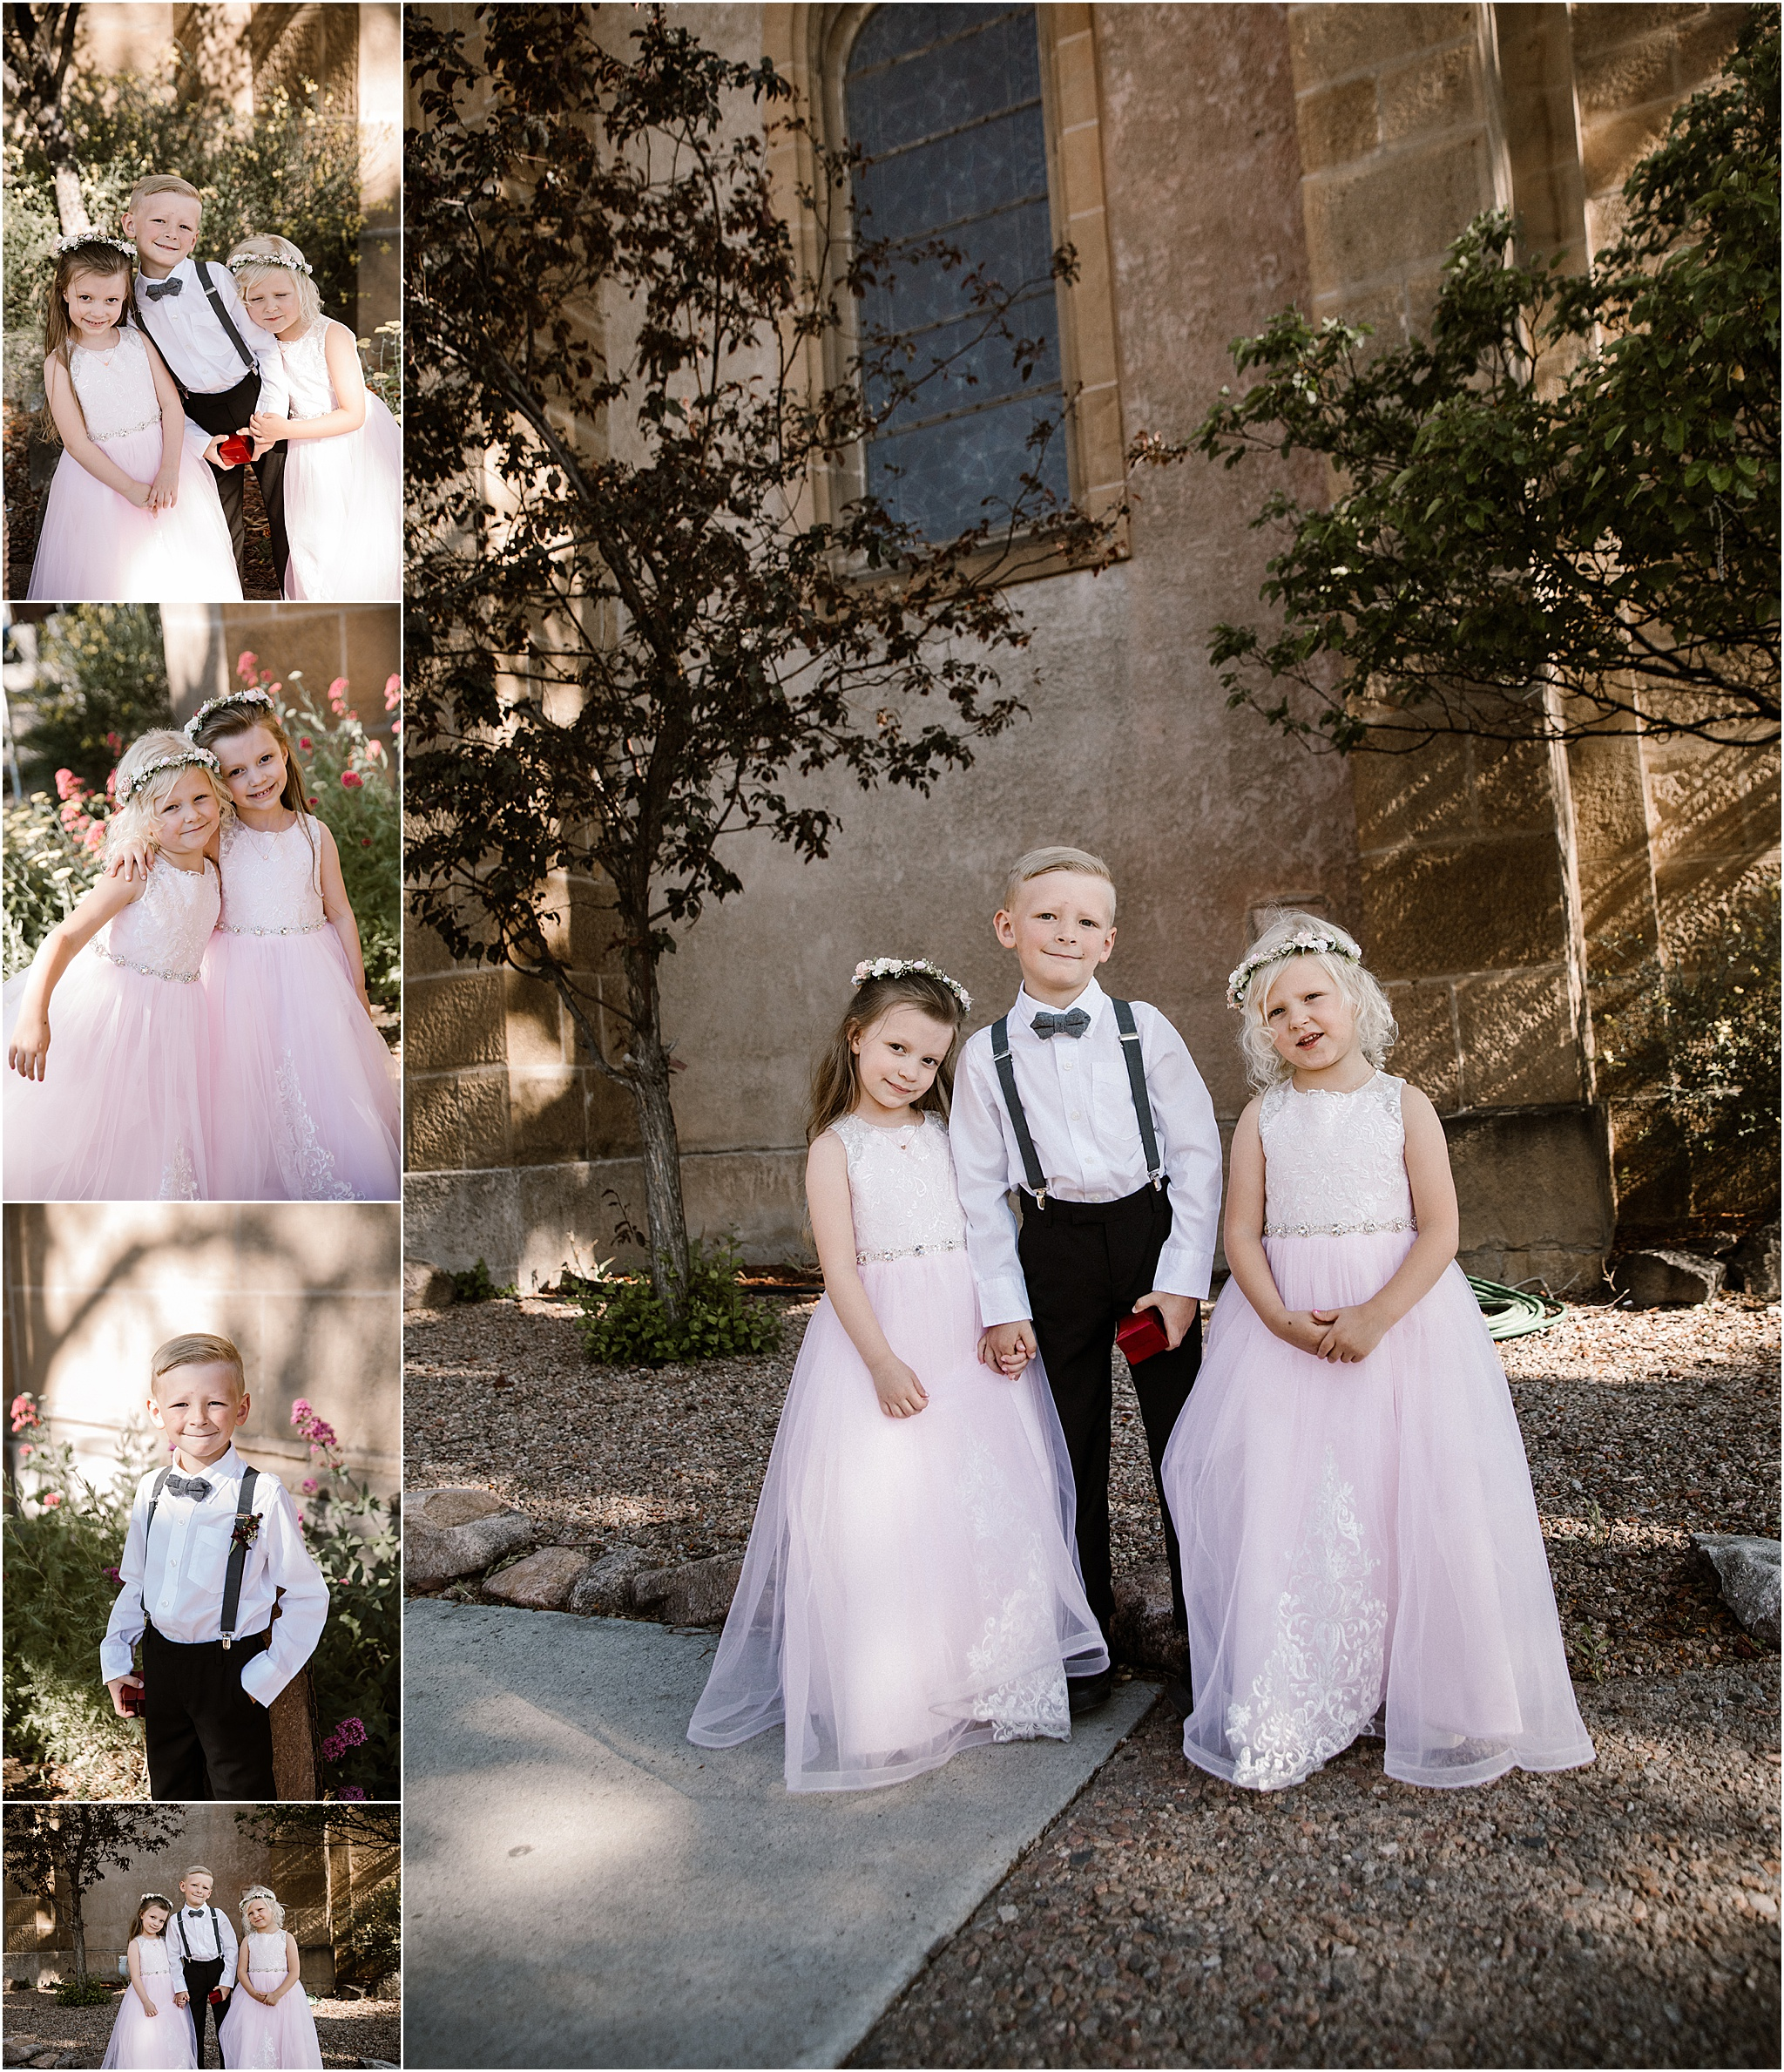 BLUE ROSE PHOTOGRAPHY SANTA FE WEDDING_18